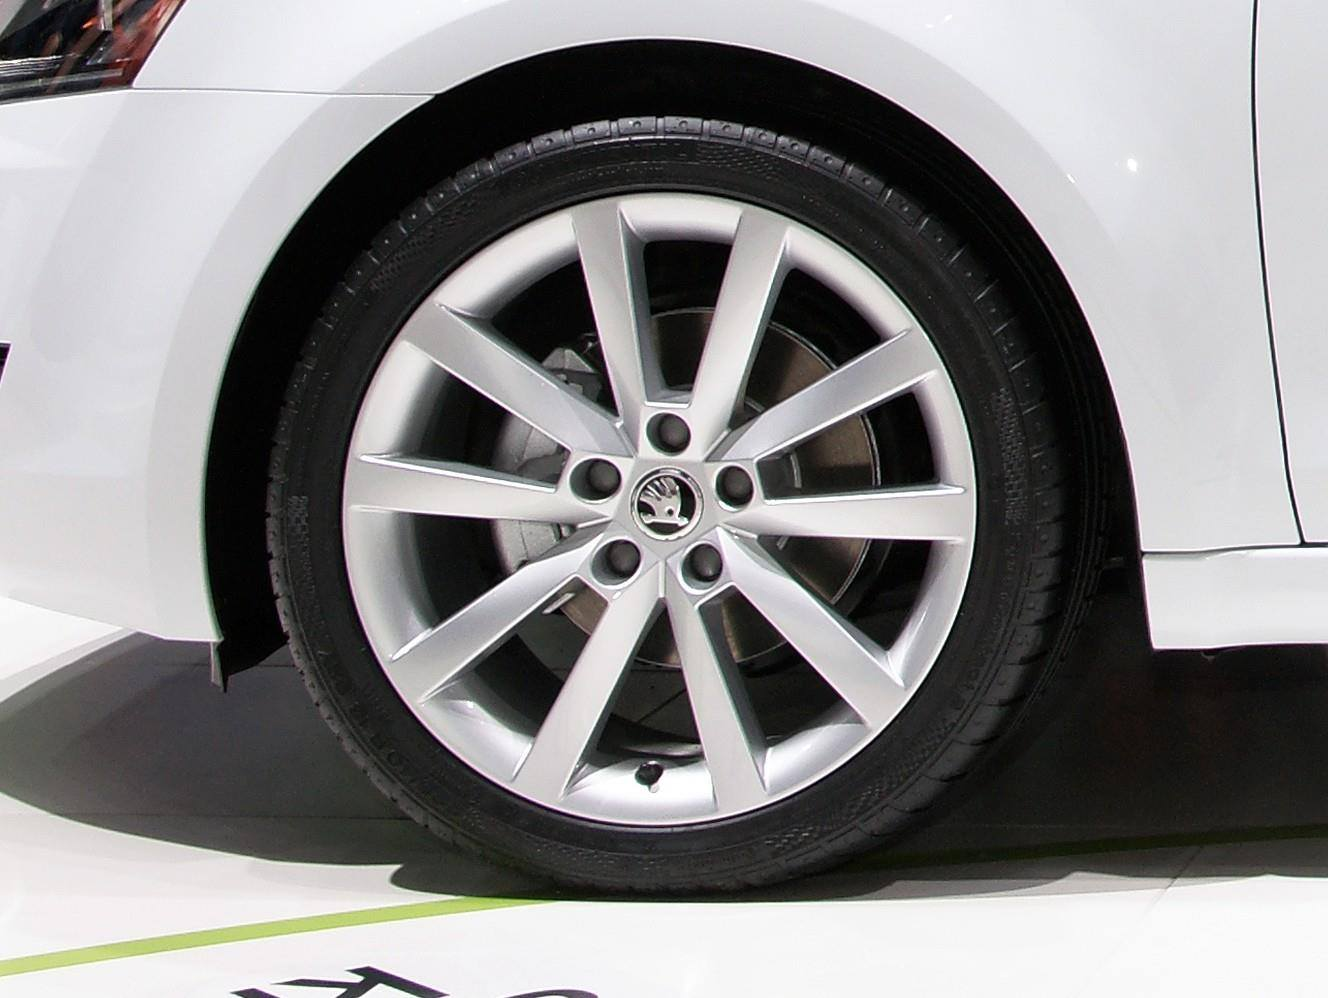 Pirelli P Zero >> Your Cool Skoda Alloy Wheel Collection Has Arrived - autoevolution